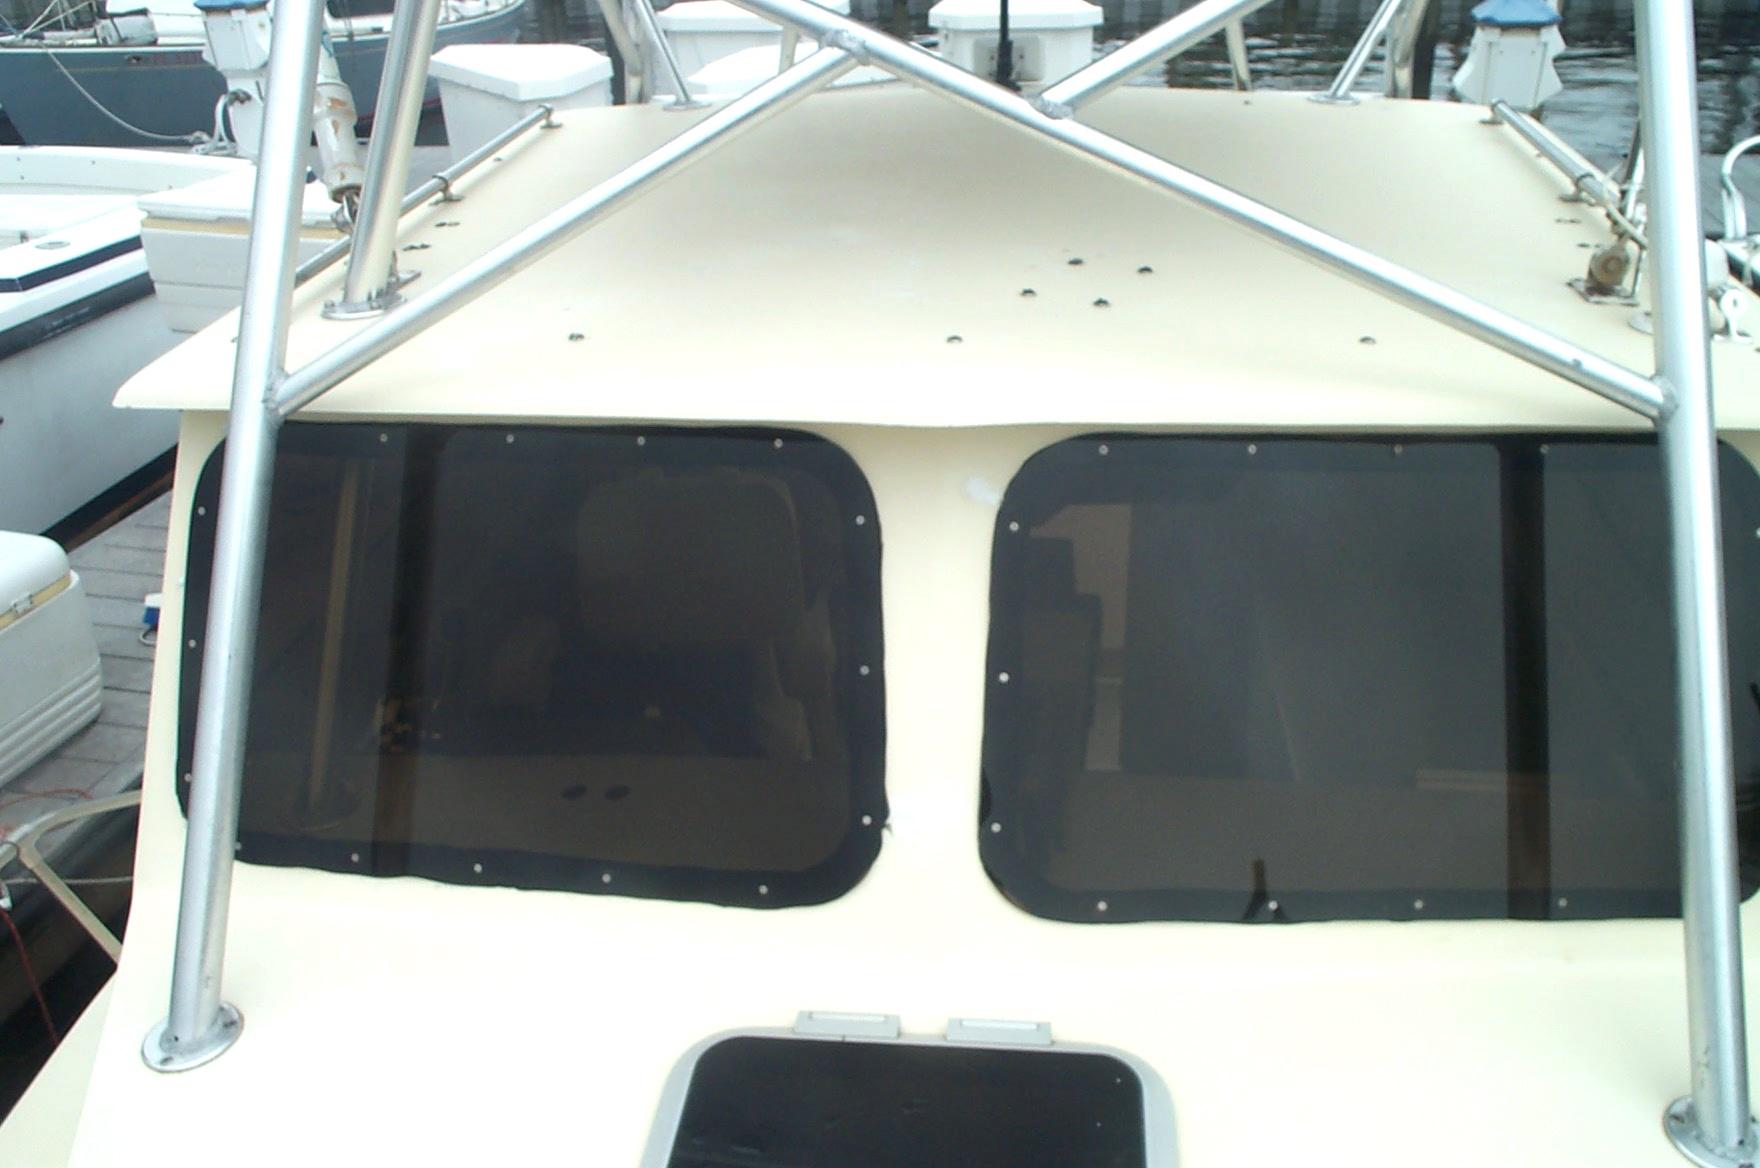 25' Kencraft Buxton Pilot House/Cummins Diesel/Tuna Tower w/ Controls-picture-017-jpg